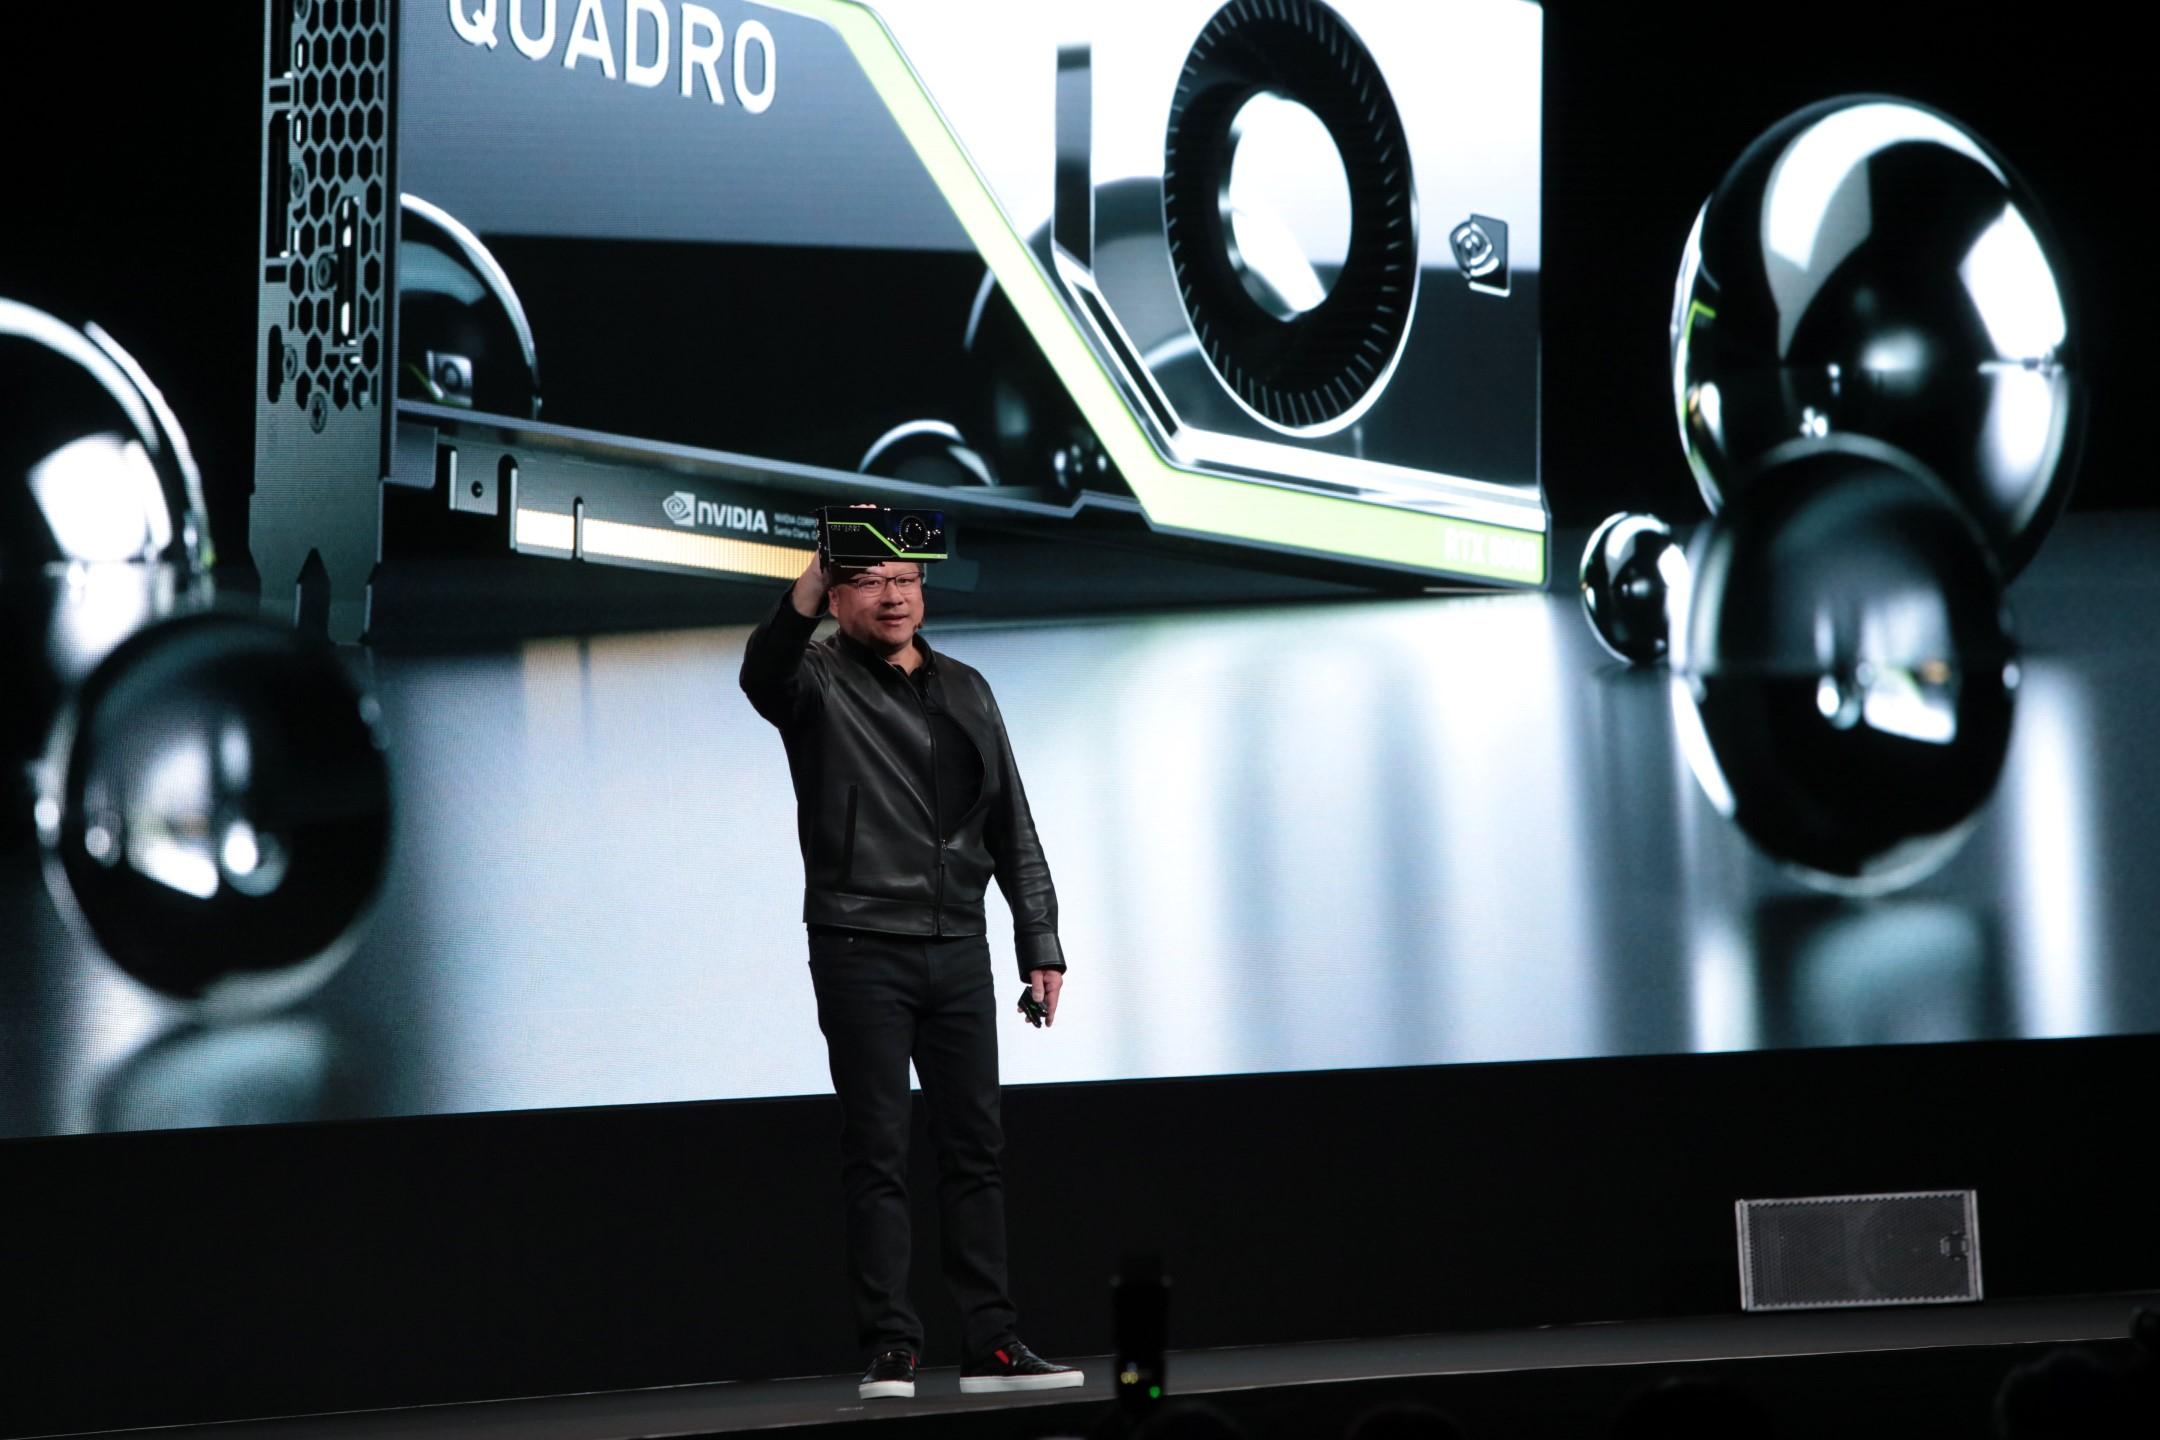 NVIDIA Demos Turing GPU Based Quadro RTX Graphics Card in